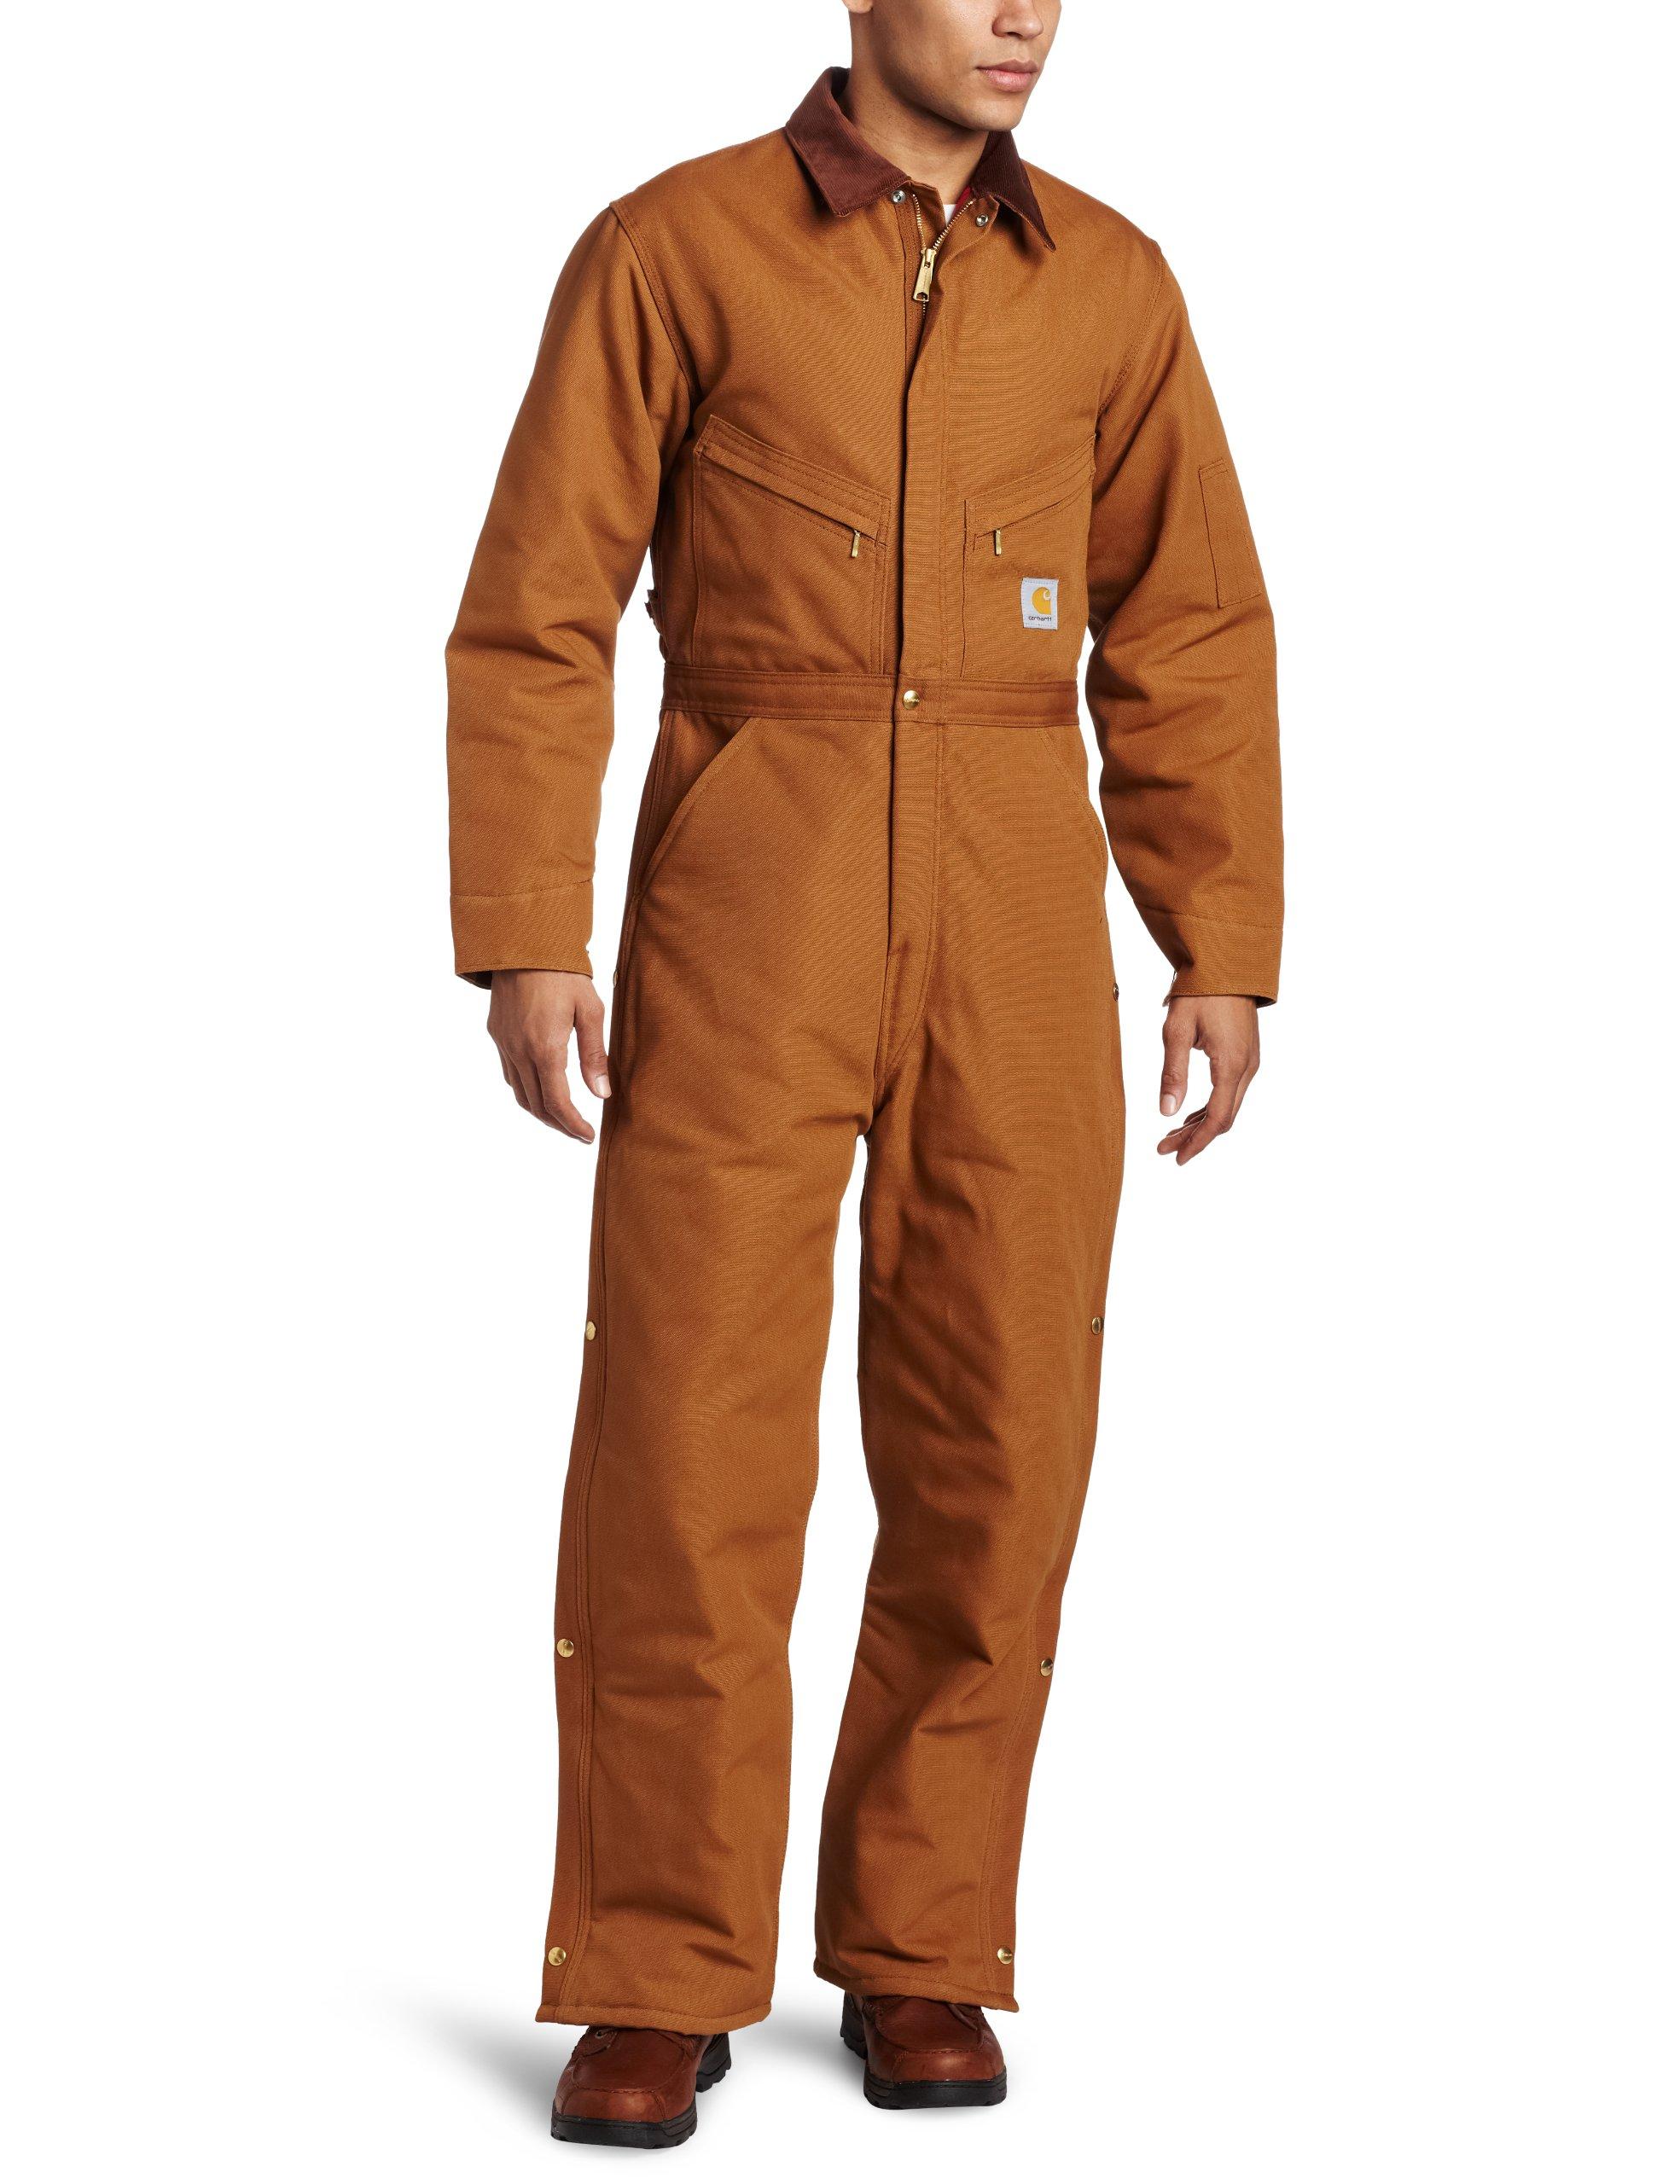 Carhartt Men's Quilt Lined Duck Coveralls,Brown,44